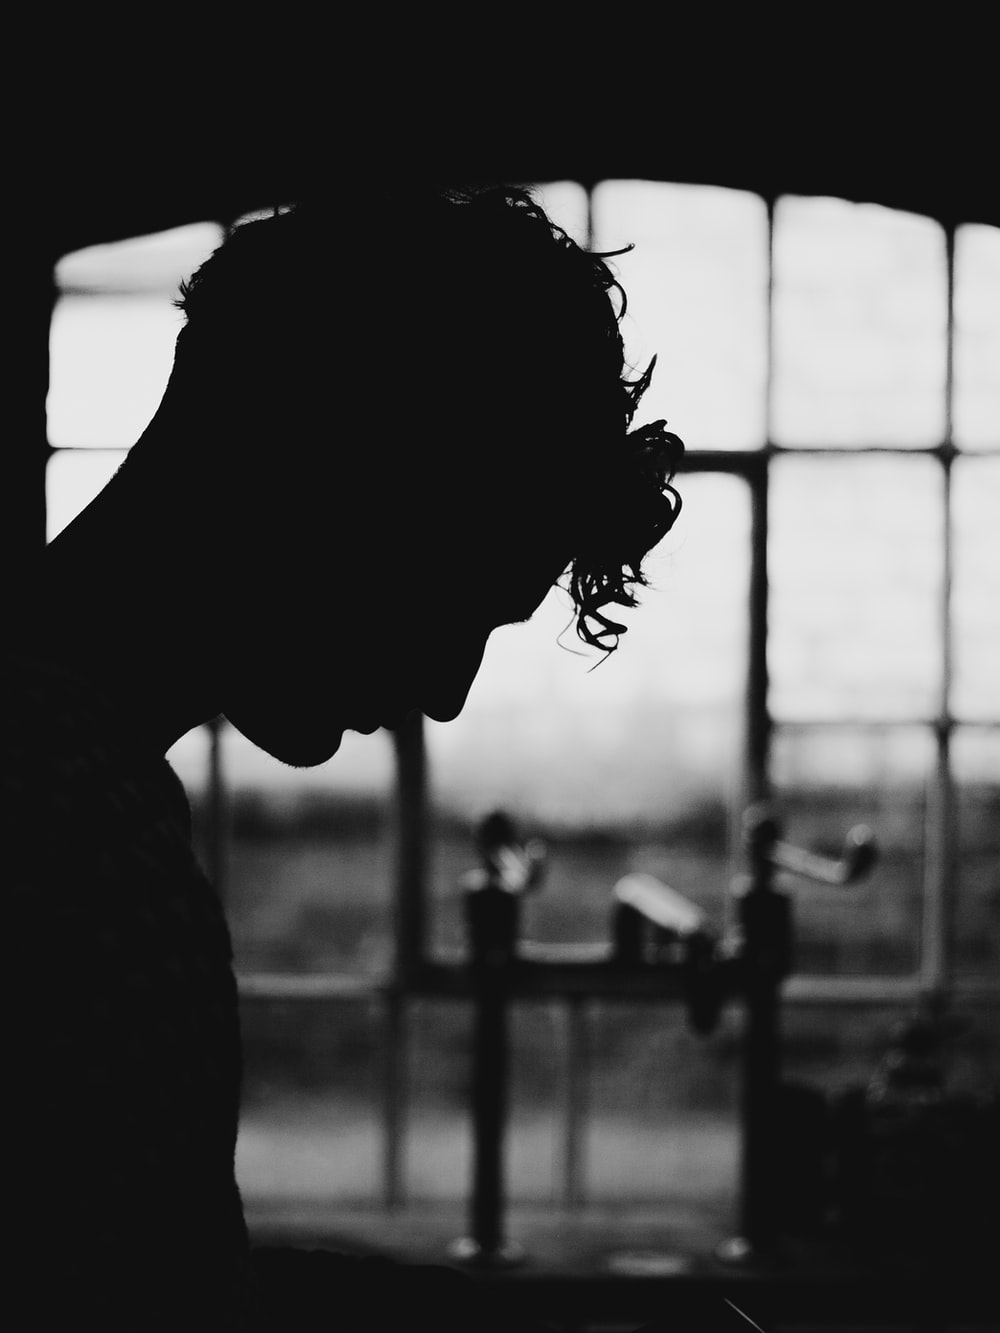 silhouette of person near window